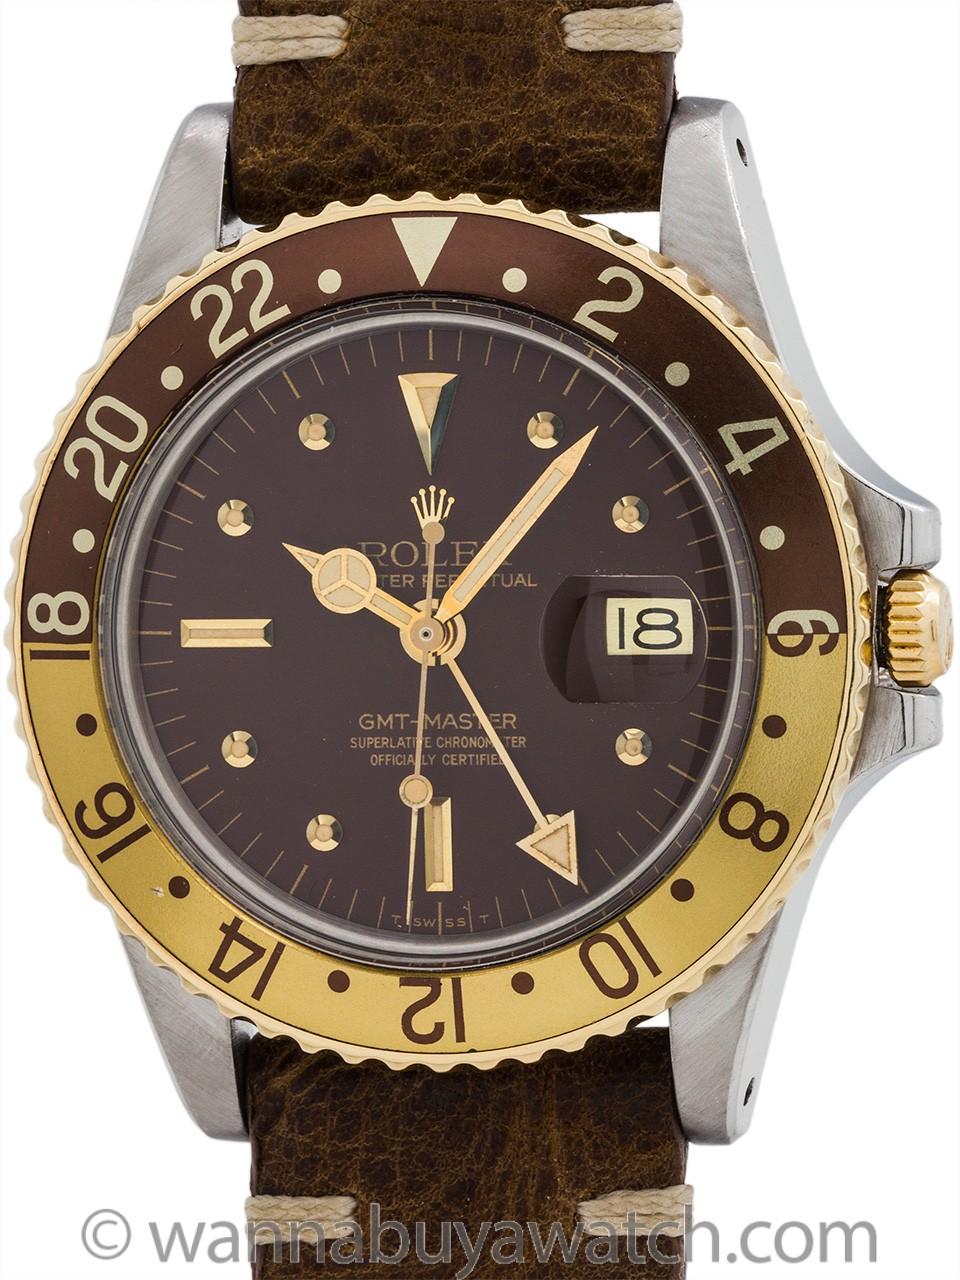 Rolex GMT-Master ref# 1675 SS/14K YG circa 1977